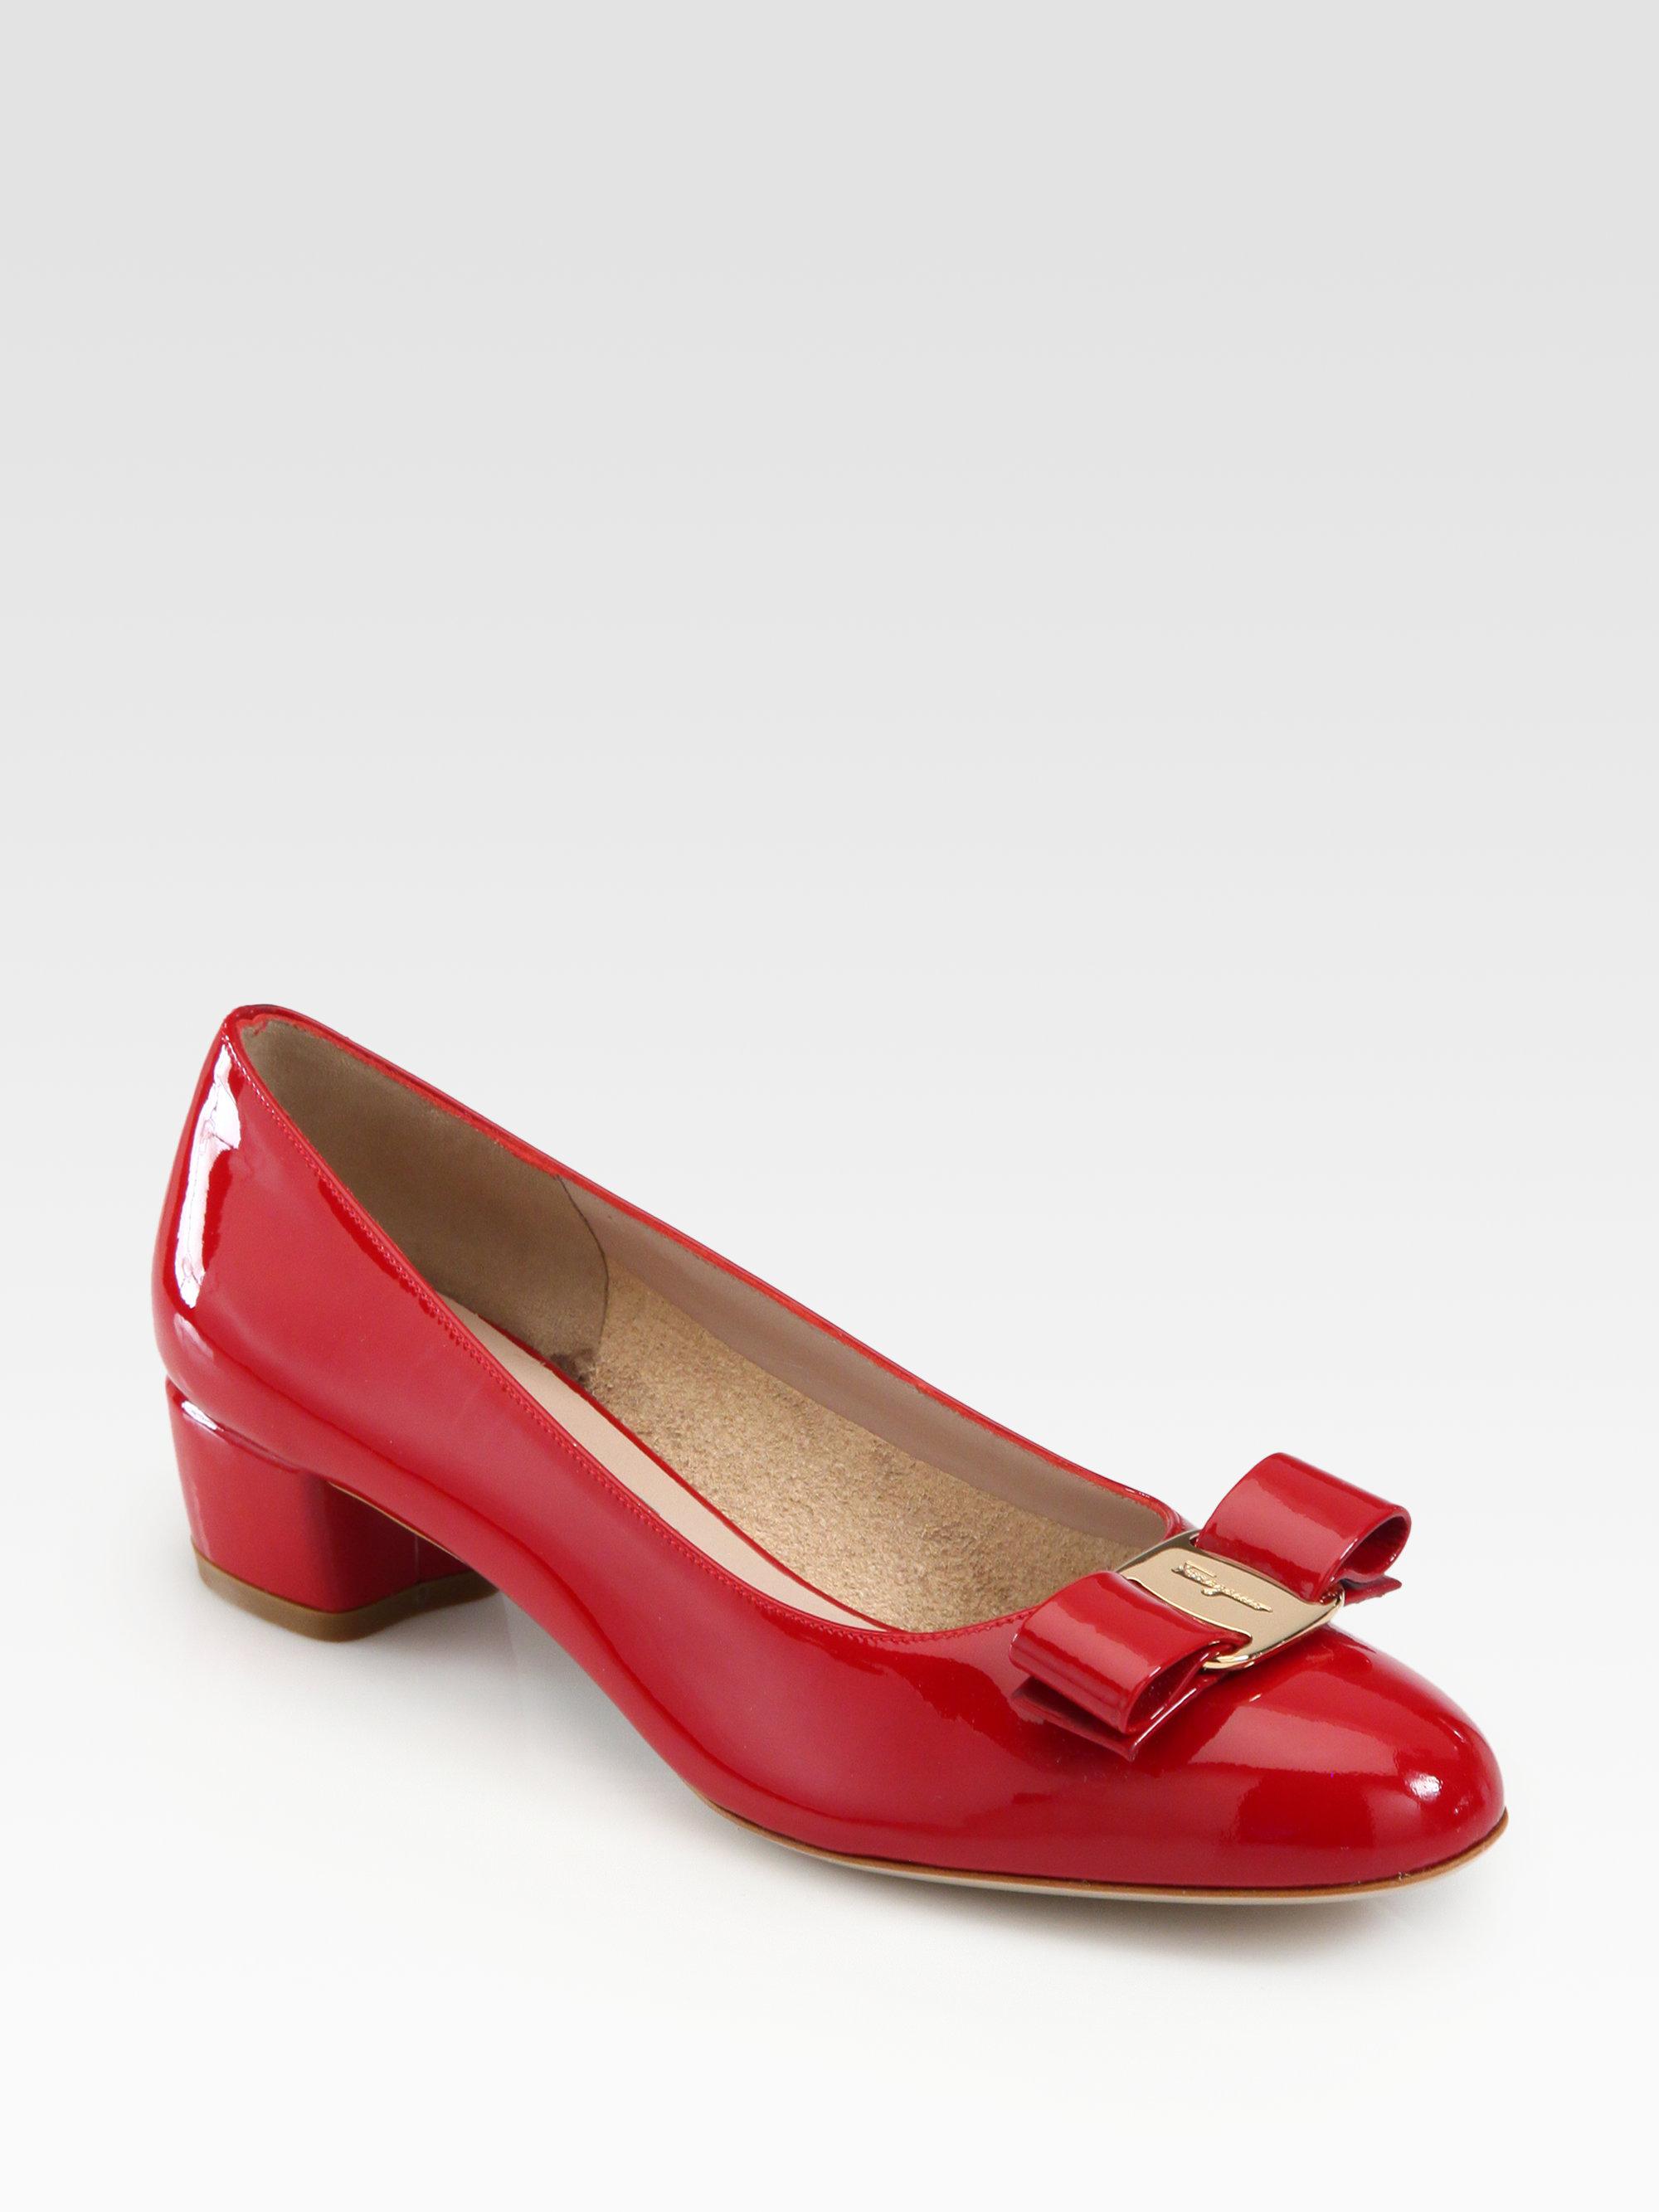 8e26768a0dc0 Lyst - Ferragamo Vara Patent Leather Pumps in Red